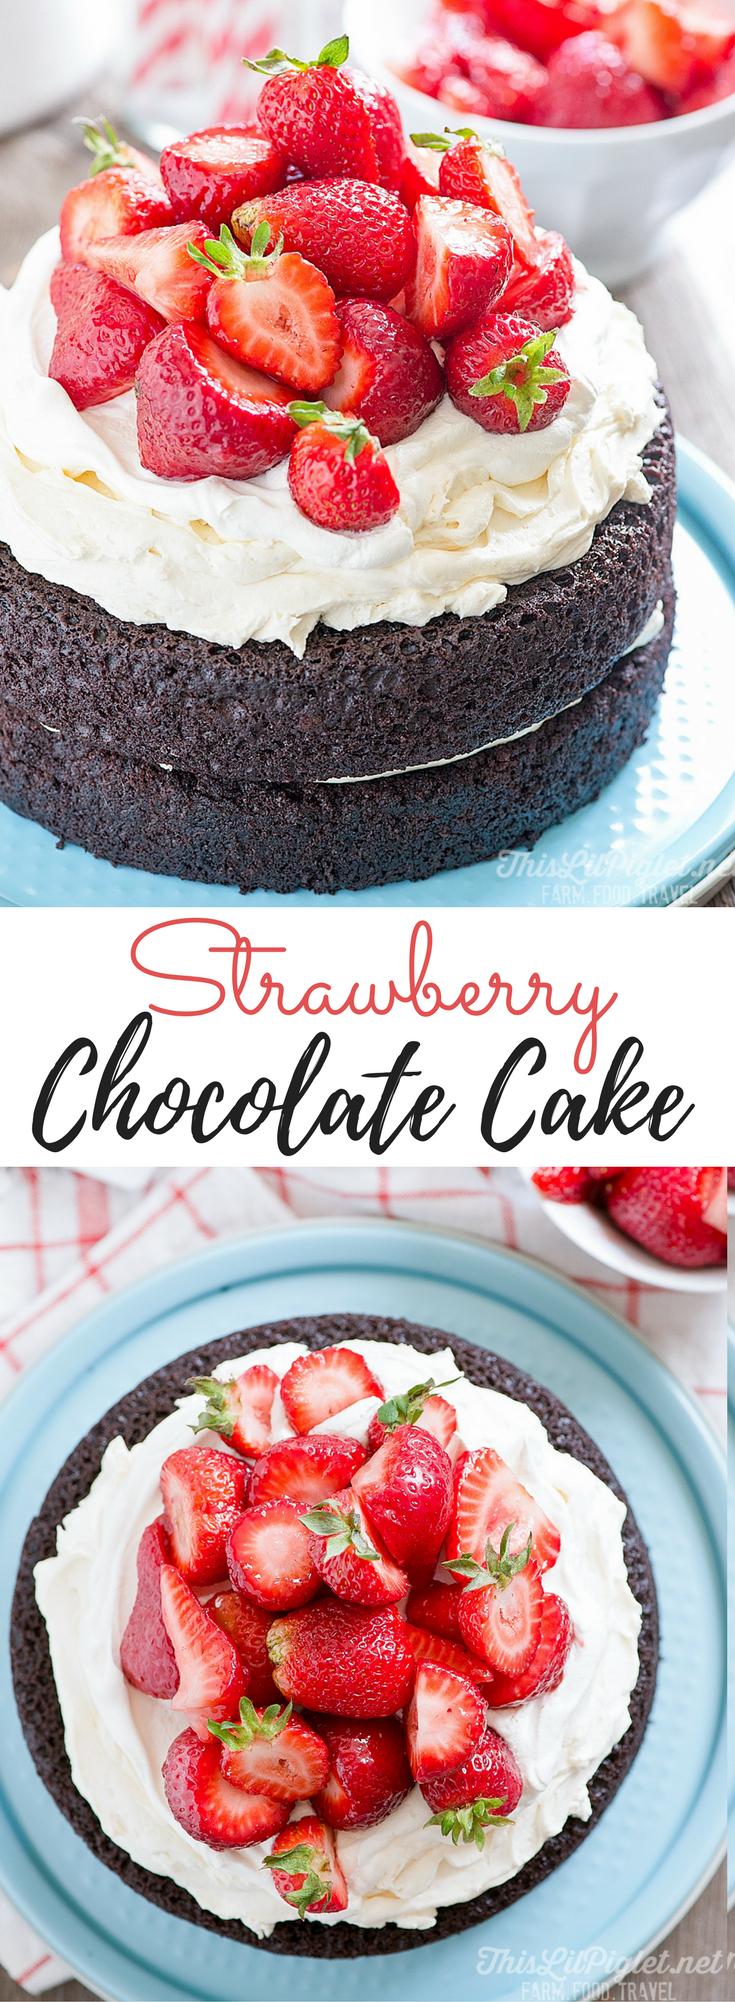 No Fuss Layered Strawberry Chocolate Cake // thislilpiglet.net